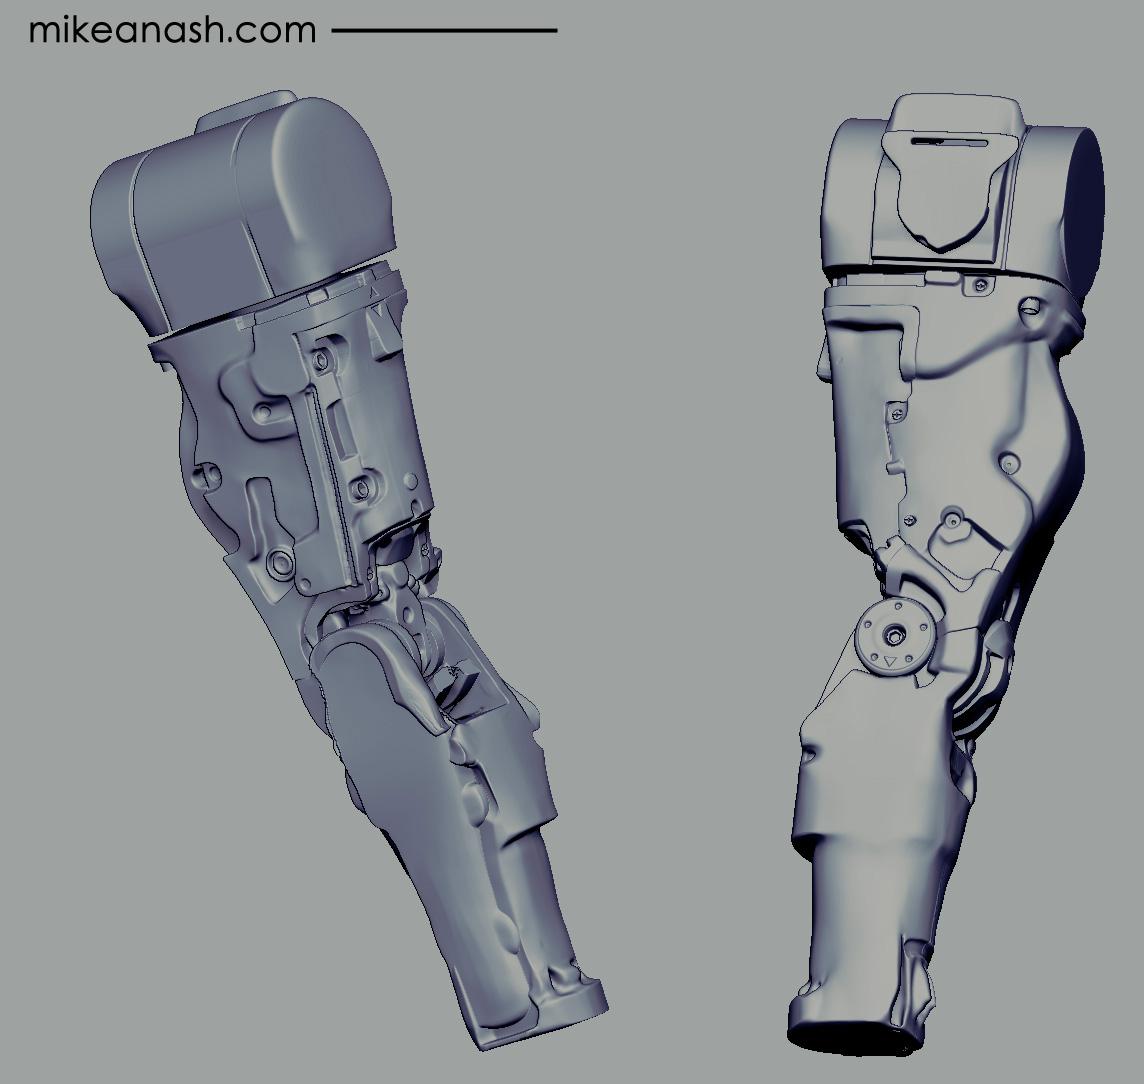 arm-1.jpg